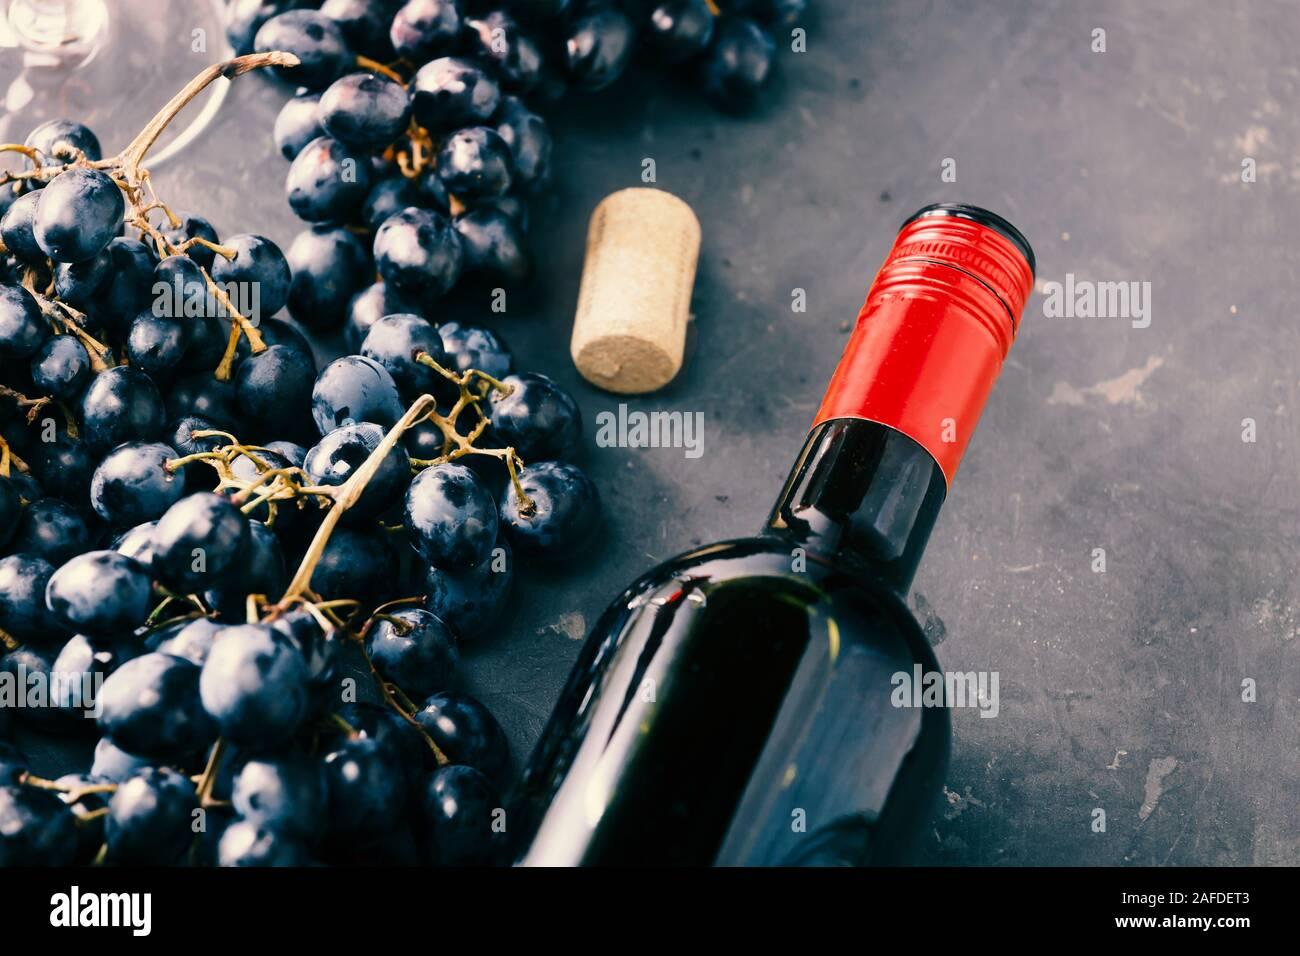 Chardonnay, Pinot noir, rosato, pinot, blume verdejo, notas de cata, oddero, chardonnay, don Foto de stock